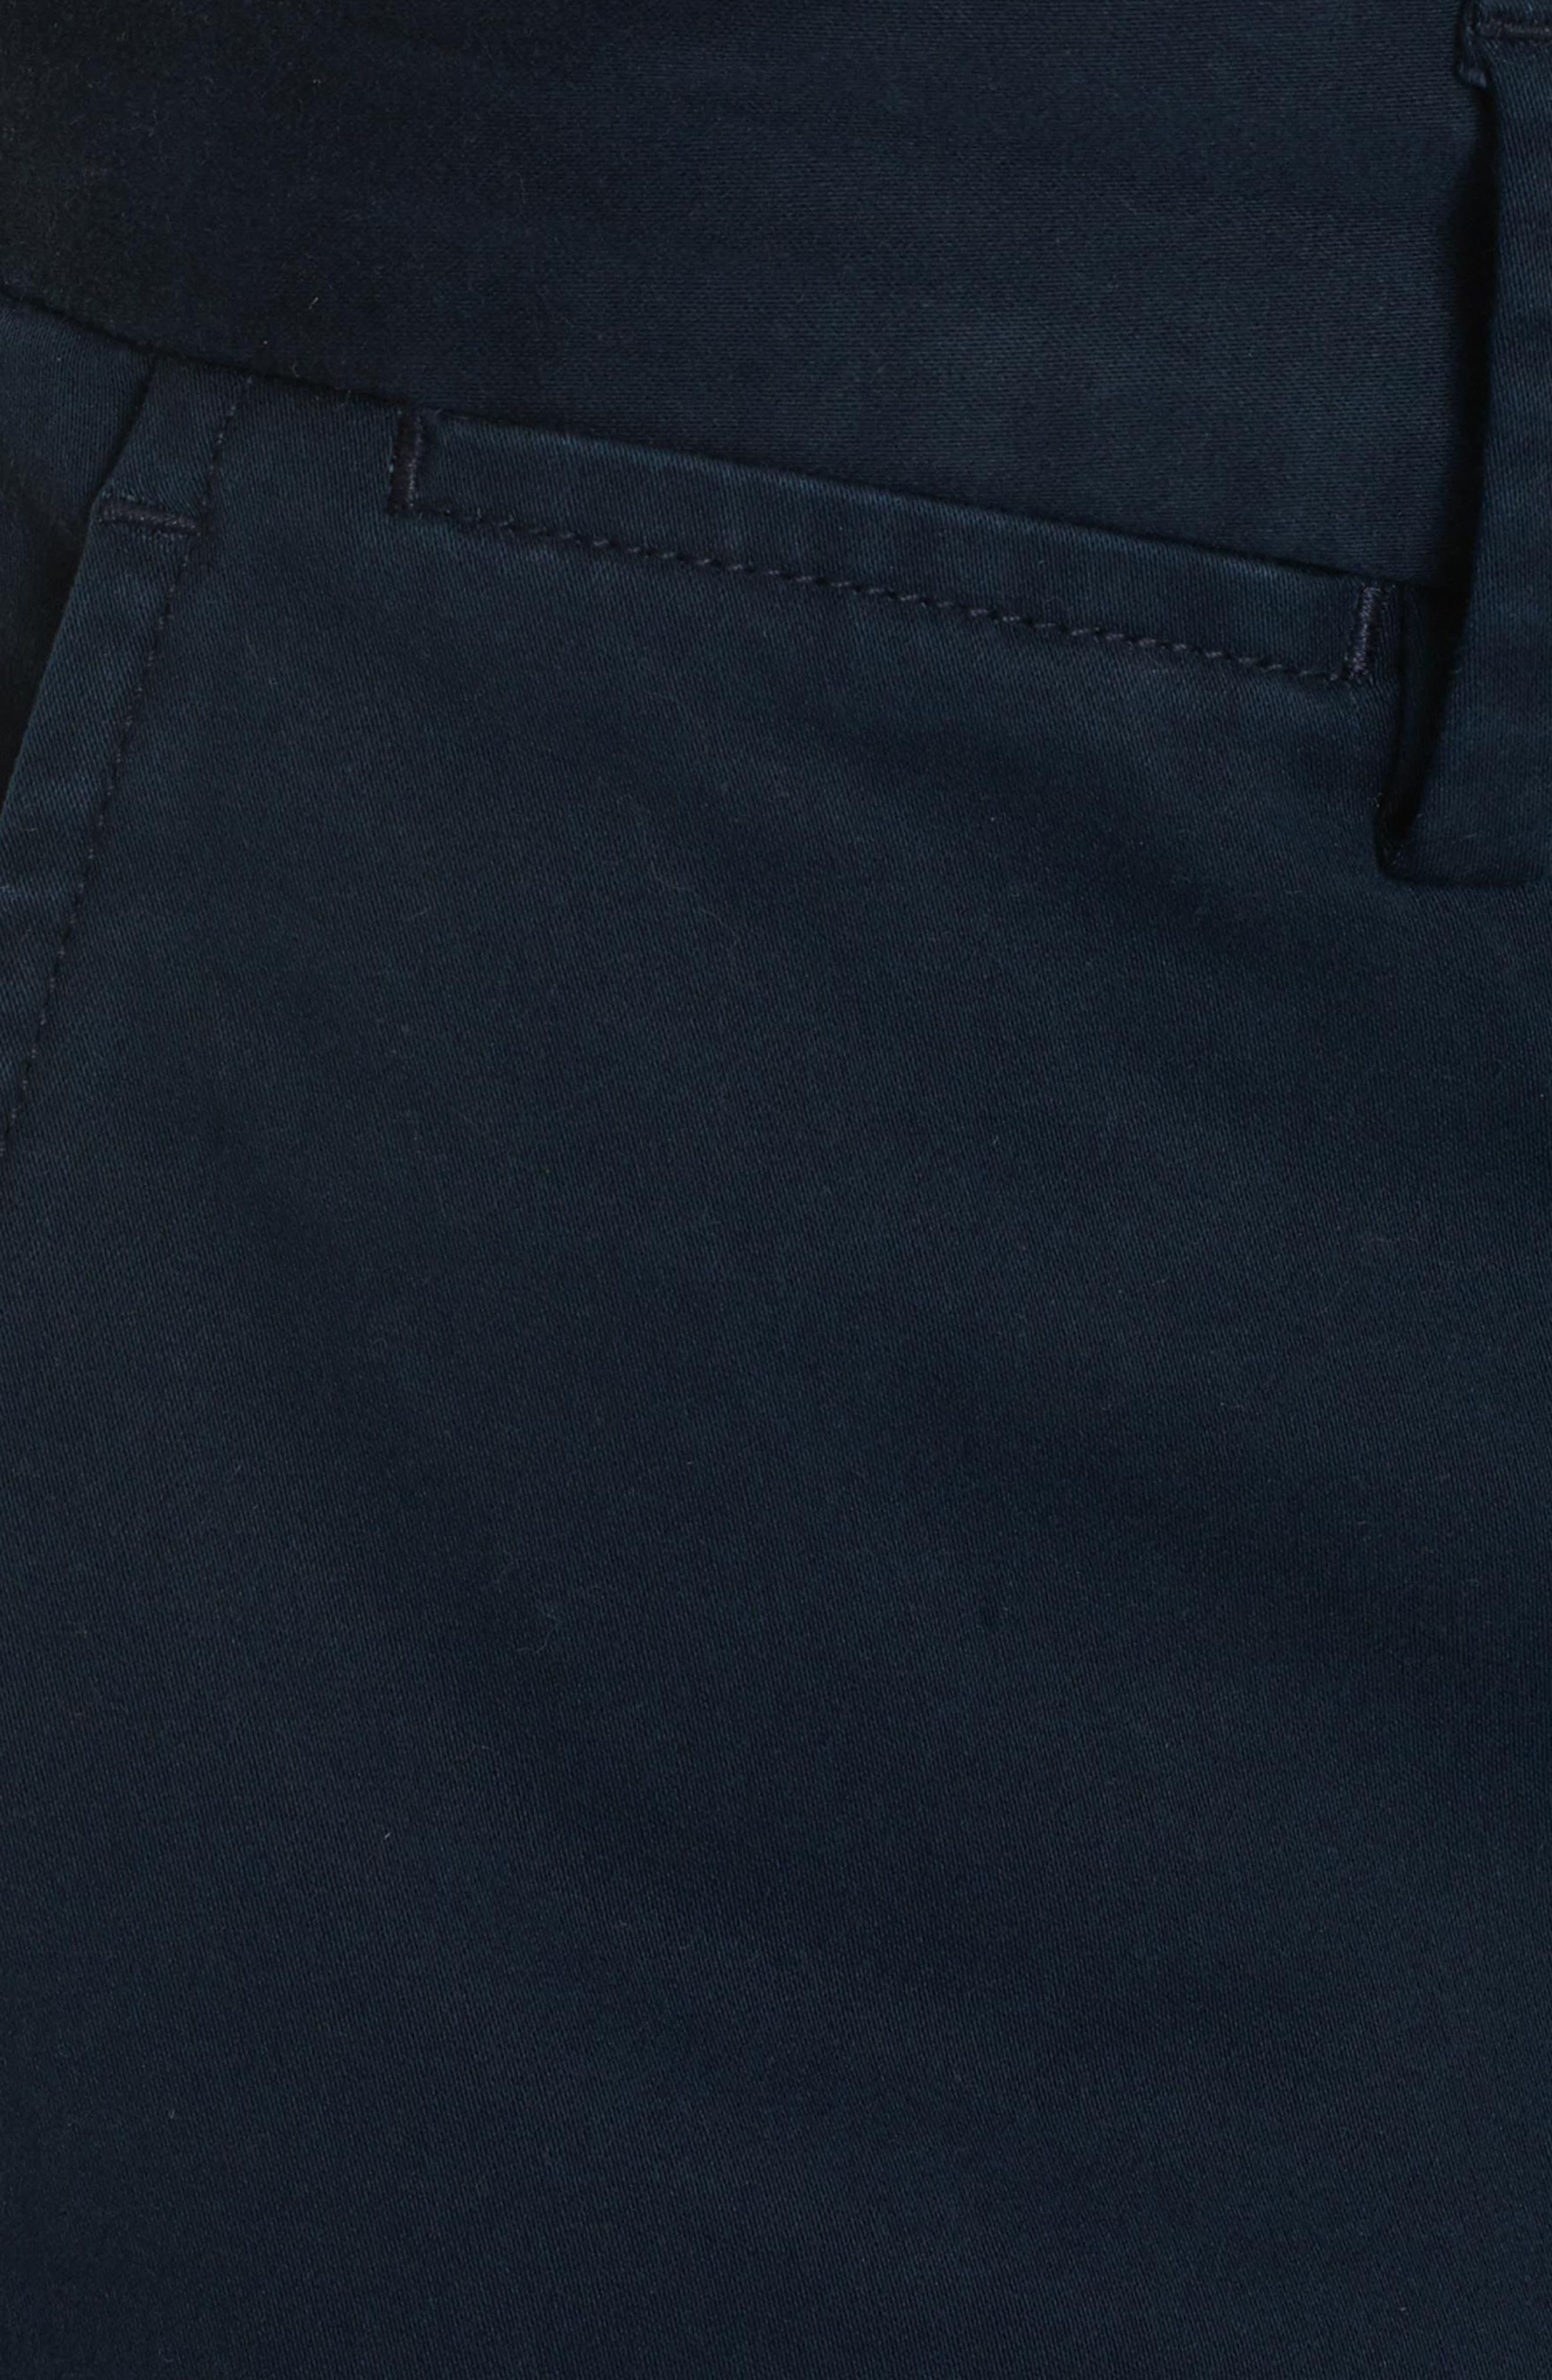 Burton Tailored Fit Pants,                             Alternate thumbnail 4, color,                             410